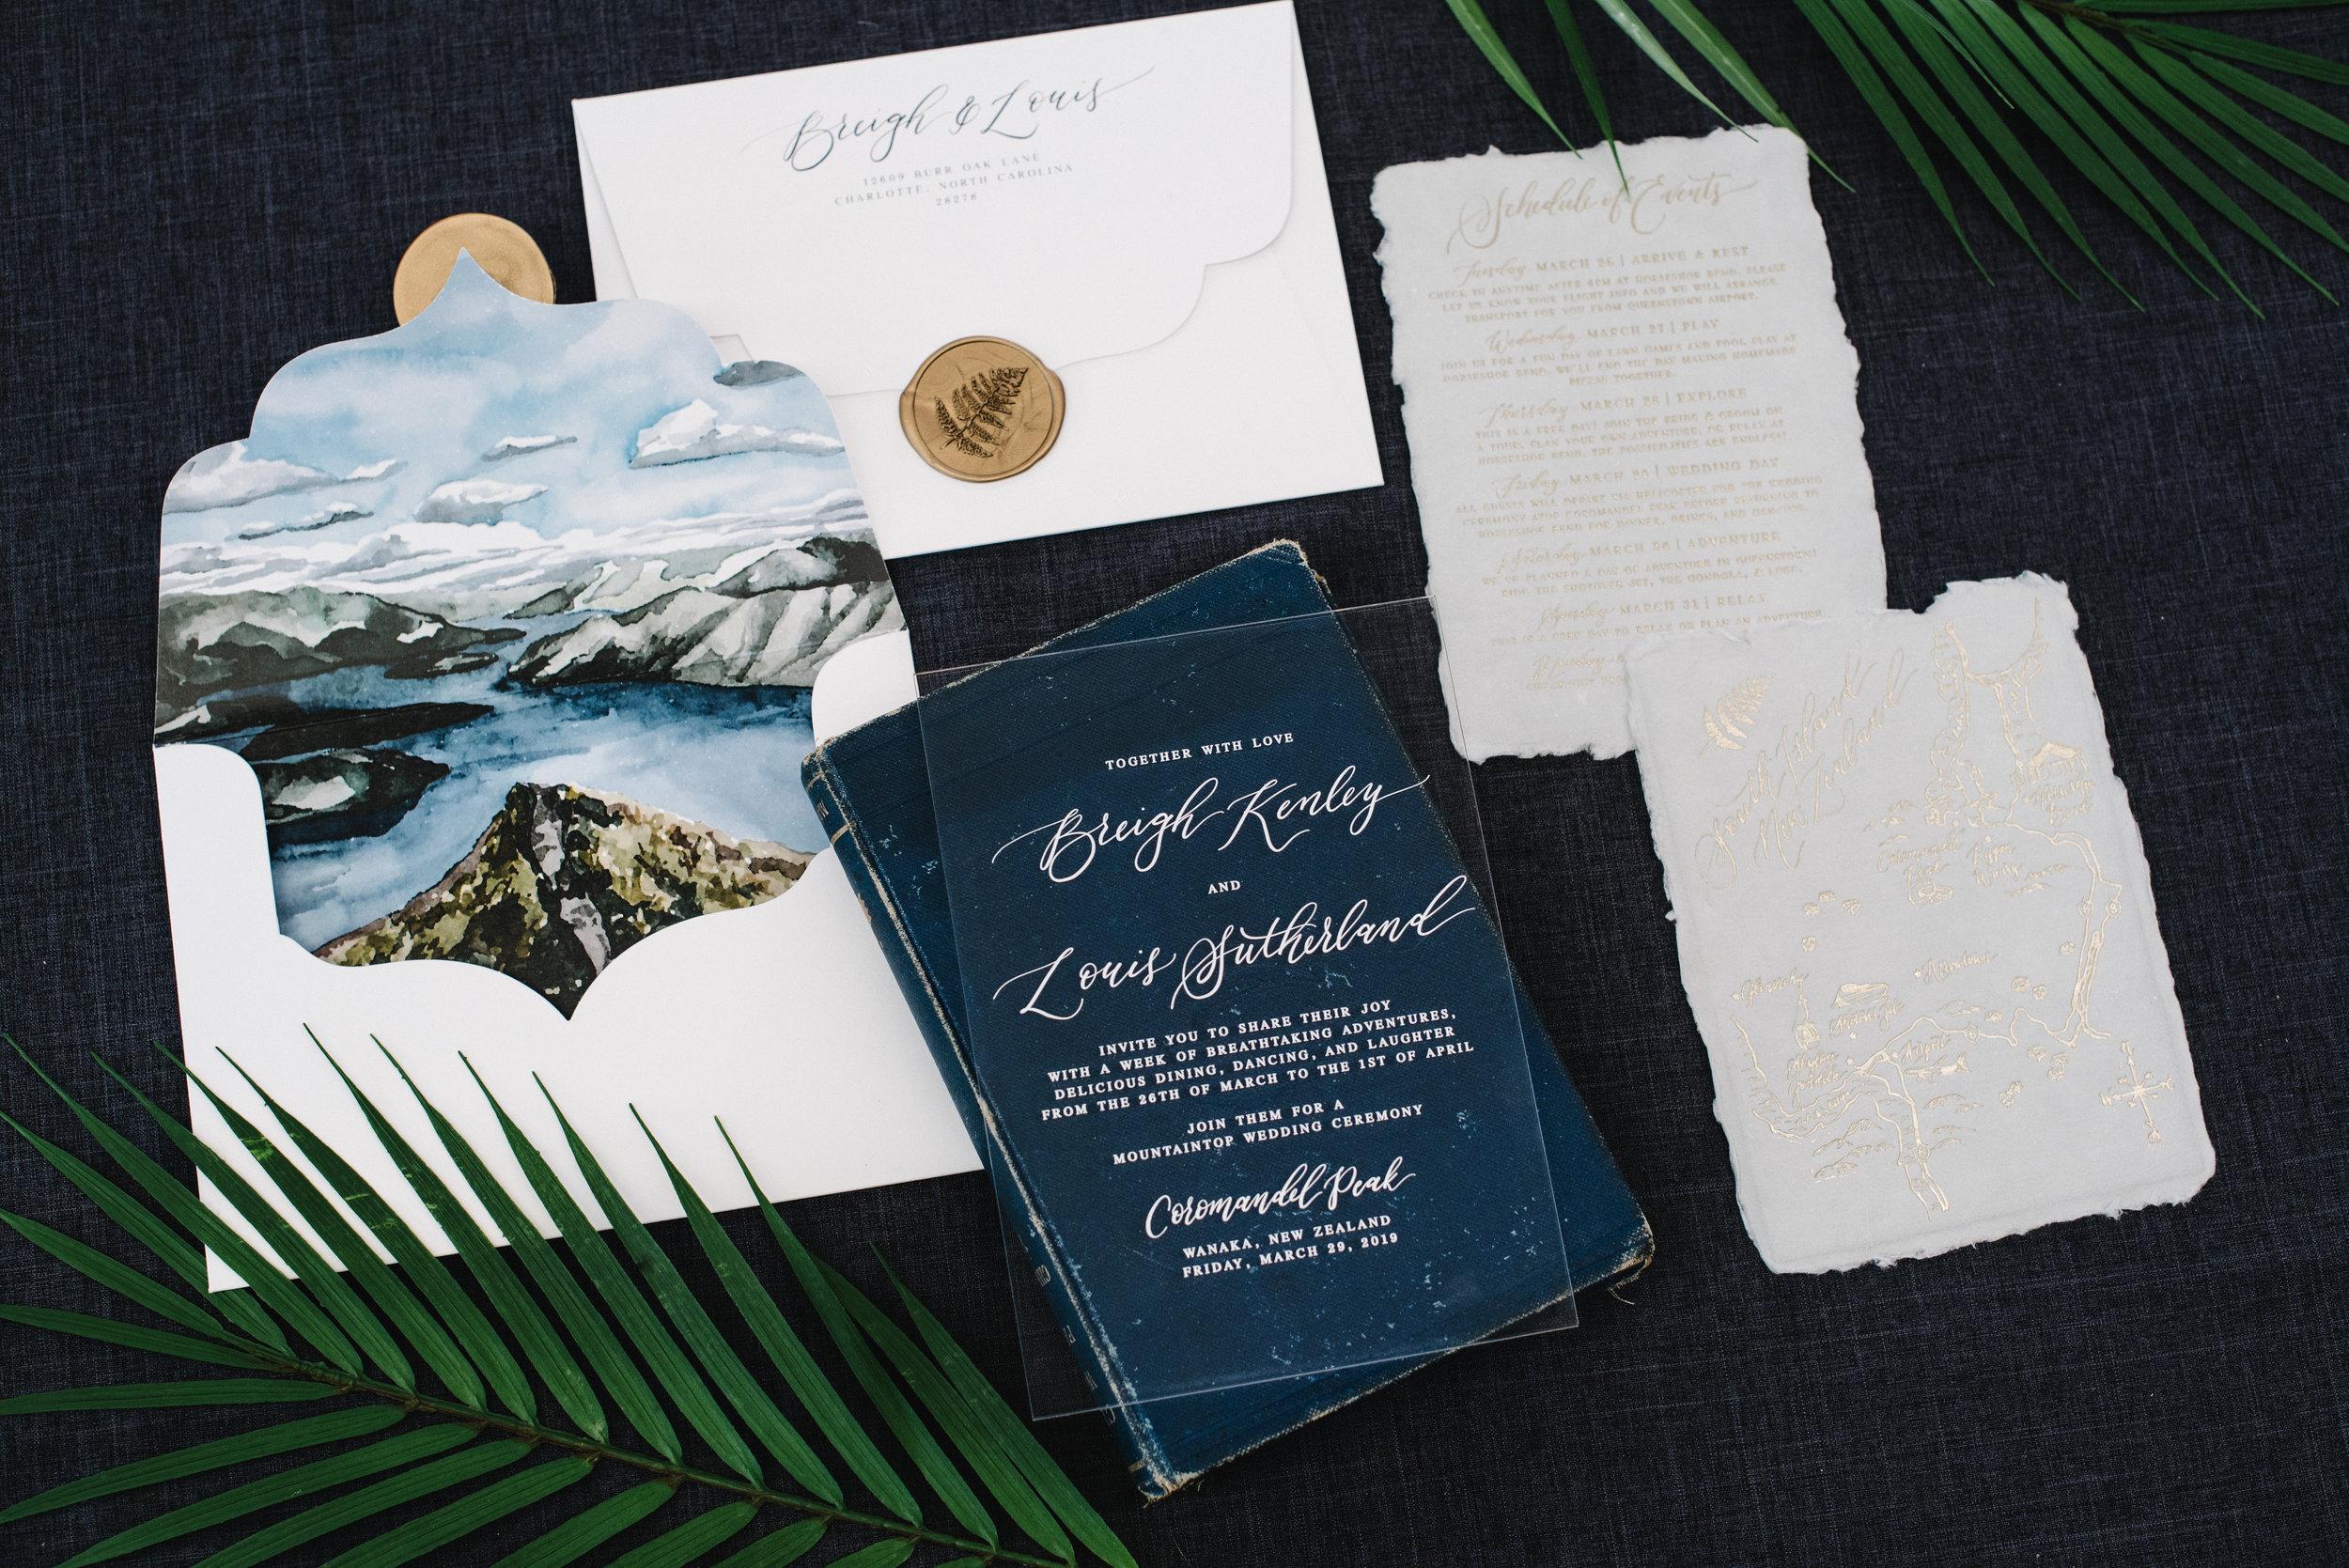 COROMANDEL PEAK, NEW ZEALAND, WATERCOLOR WEDDING INVITATIONS